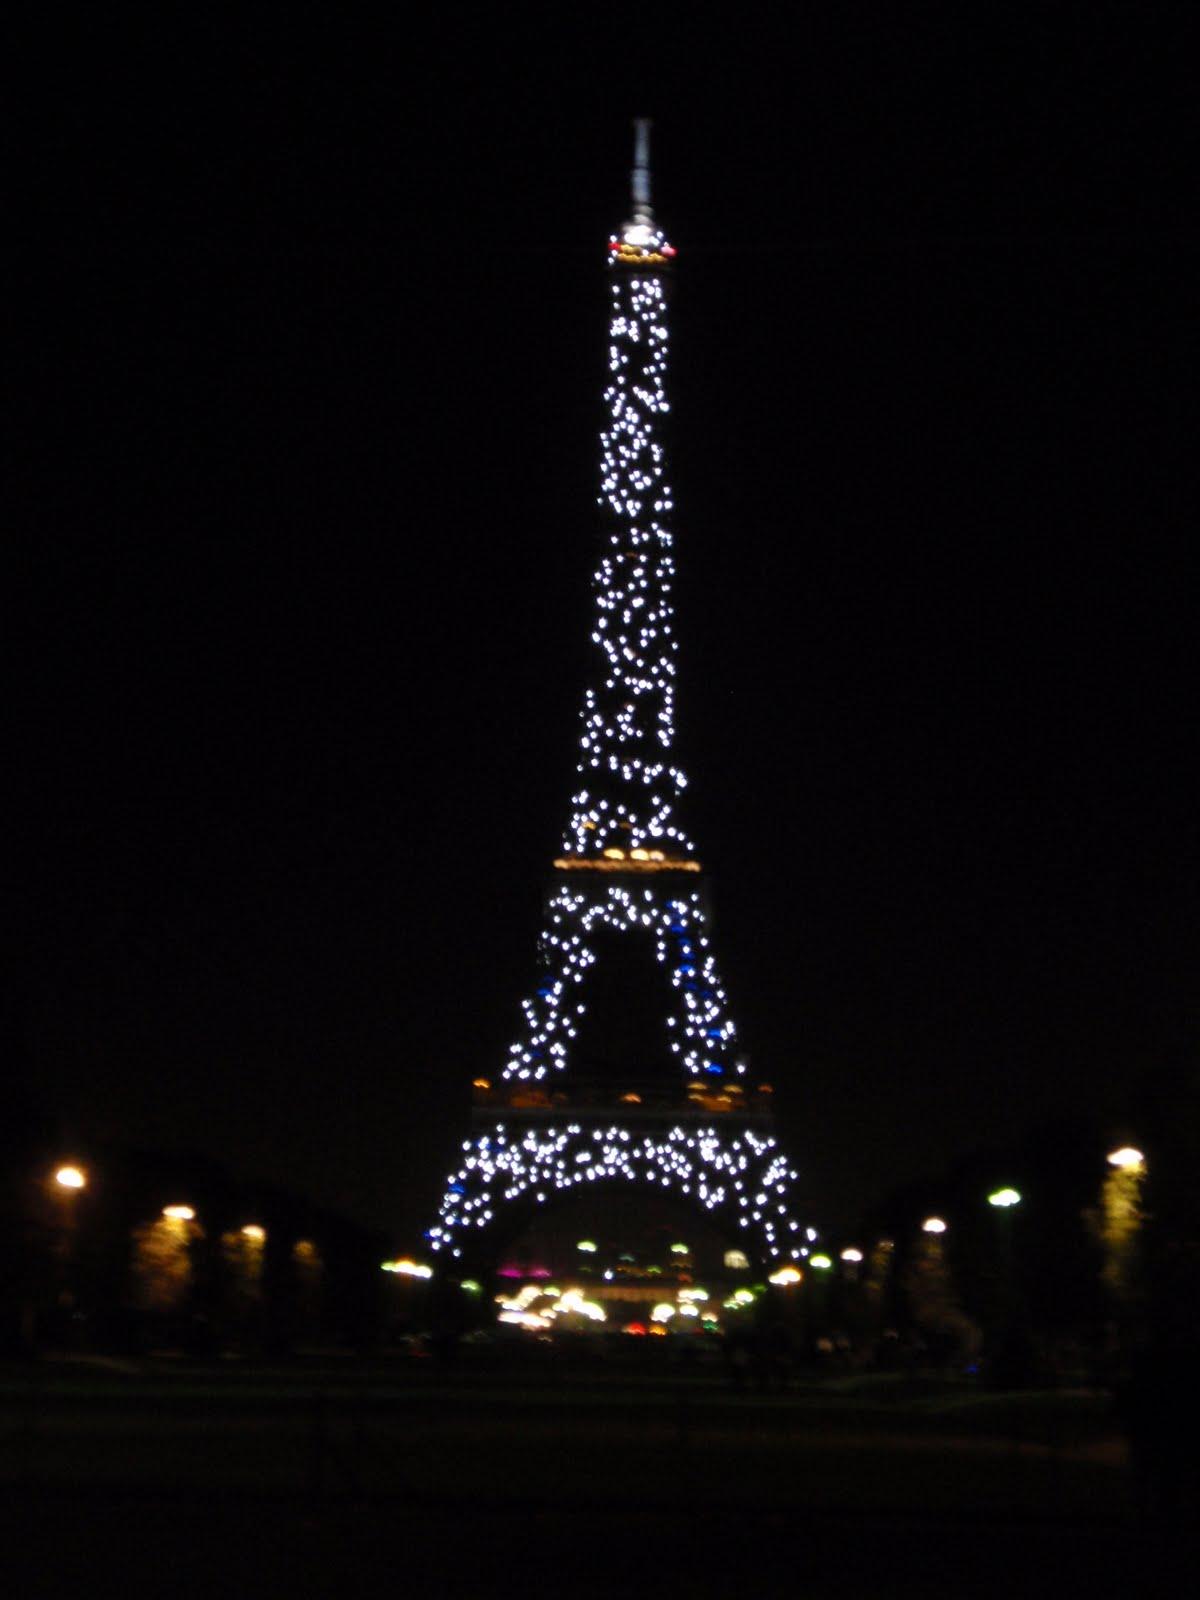 angela in oz eiffel tower celebrates 120 years